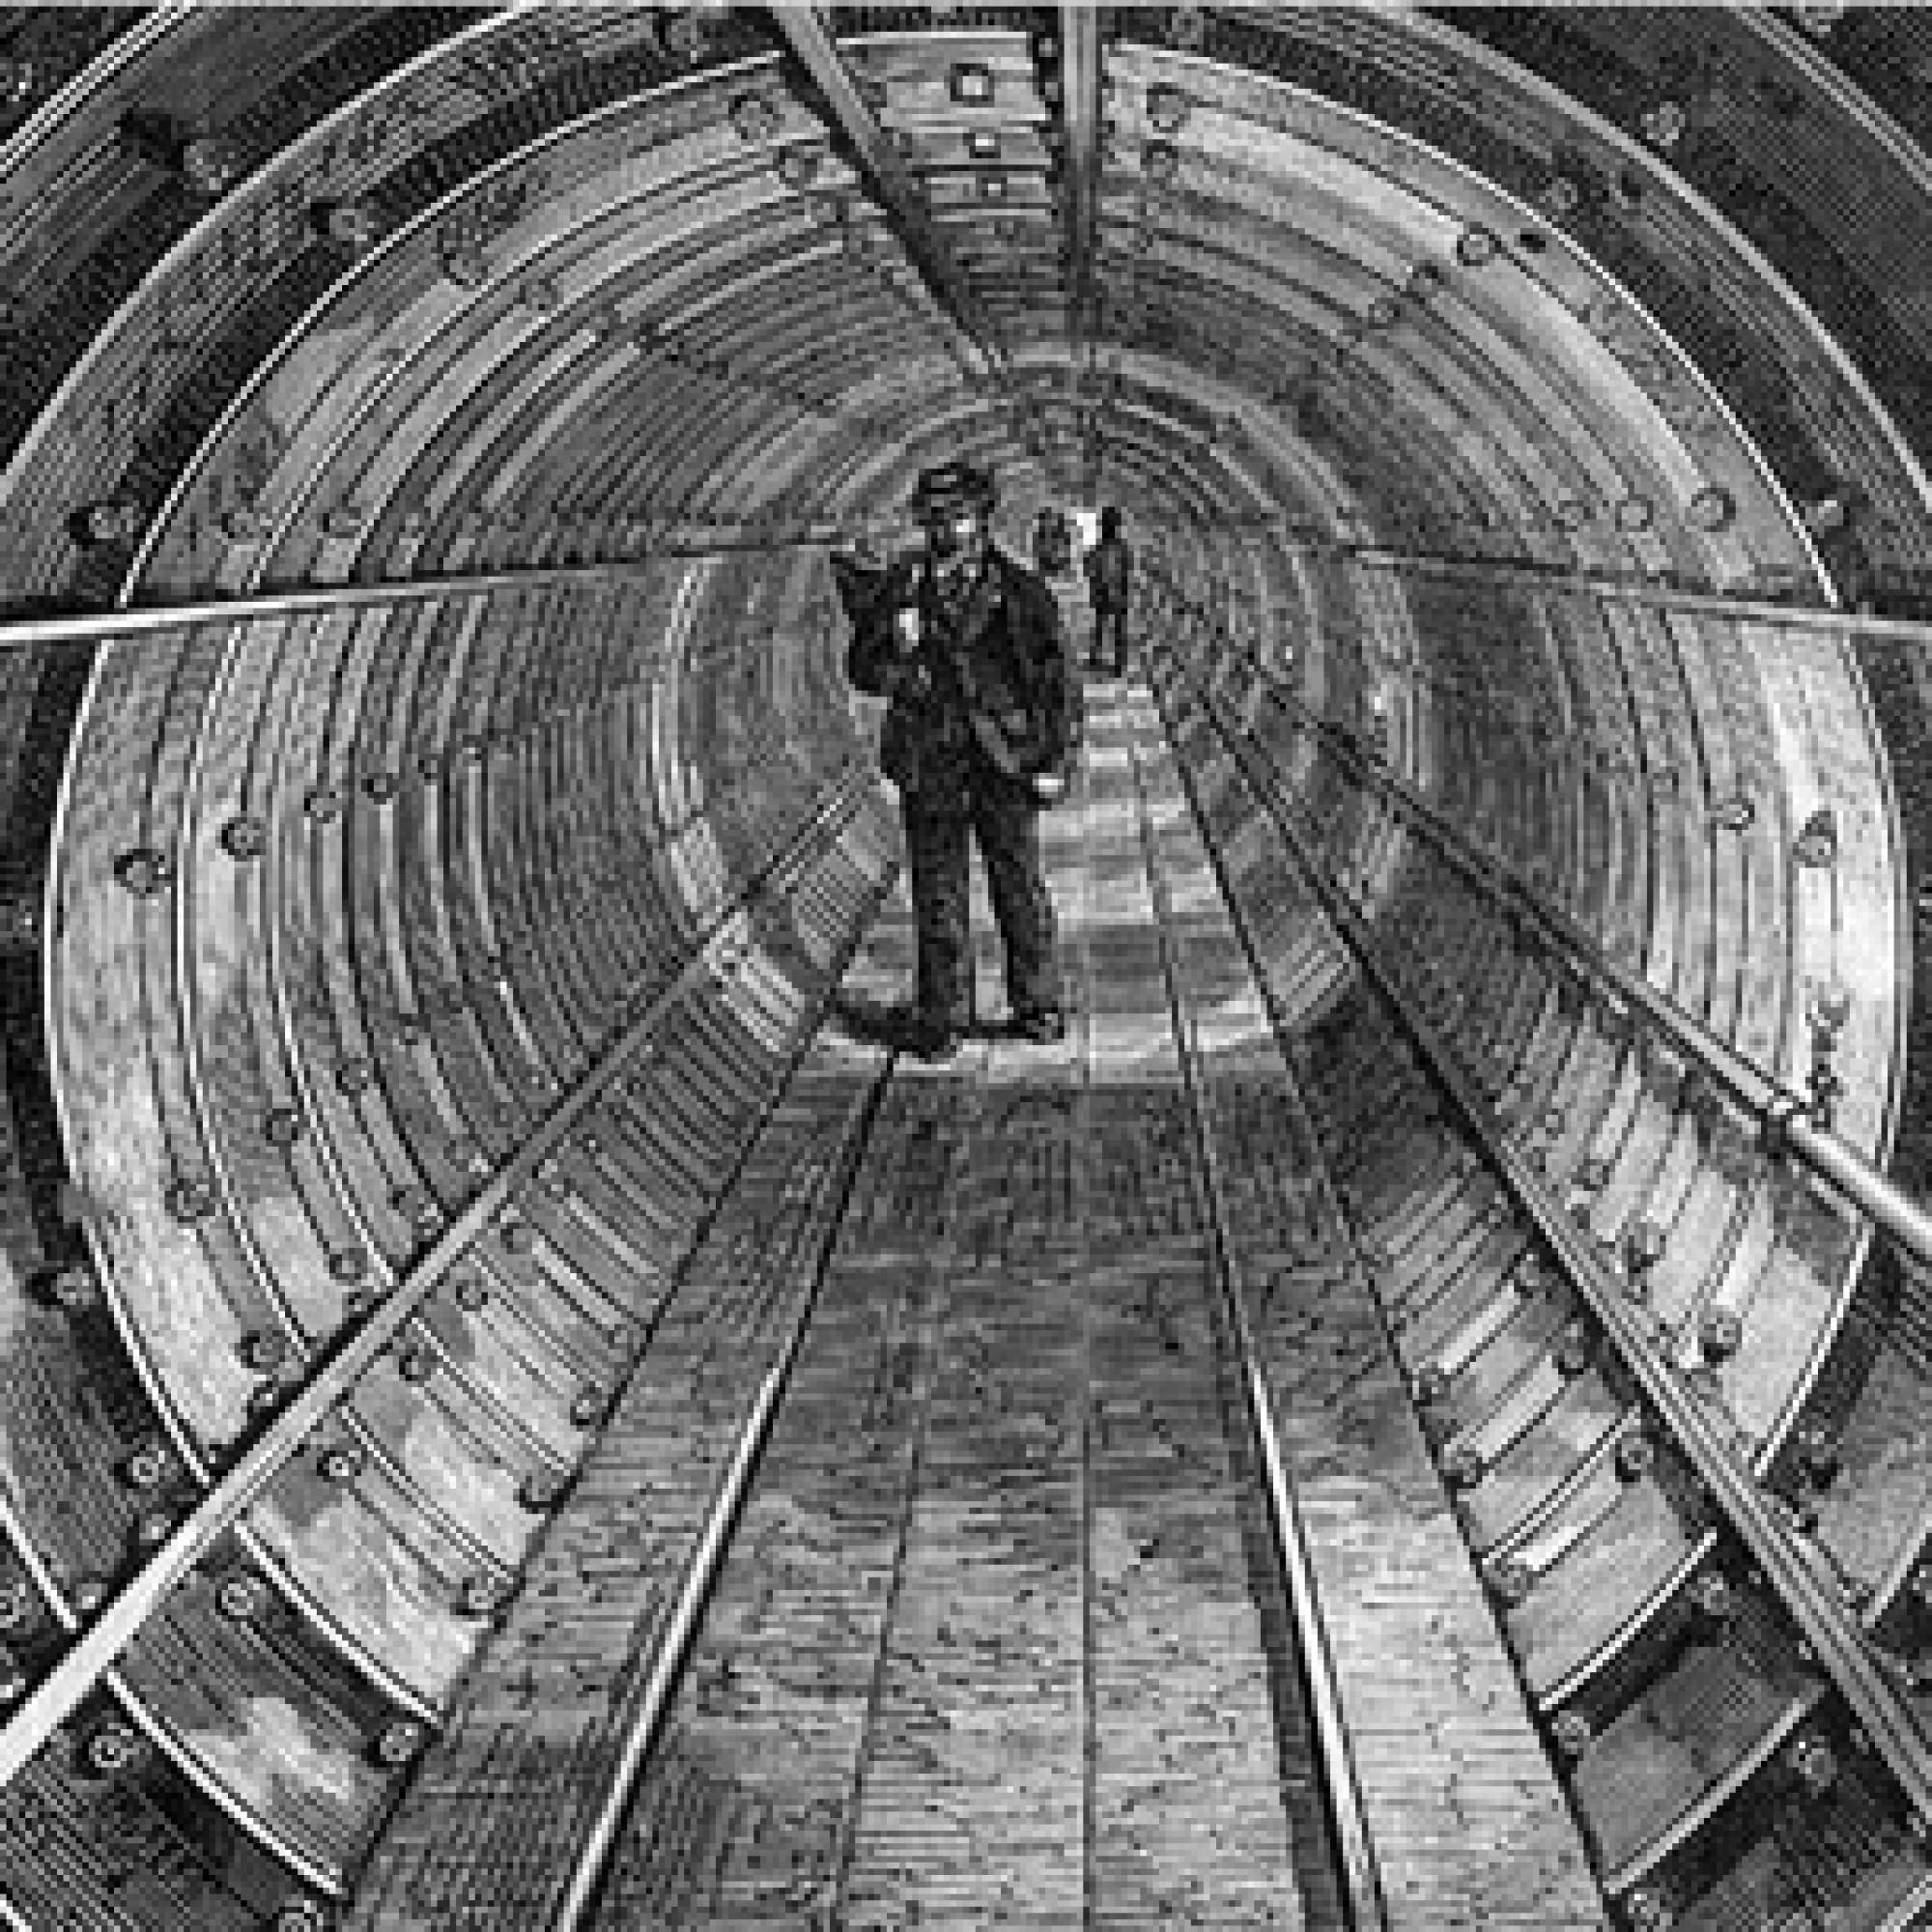 Tower Subway / wikimedia